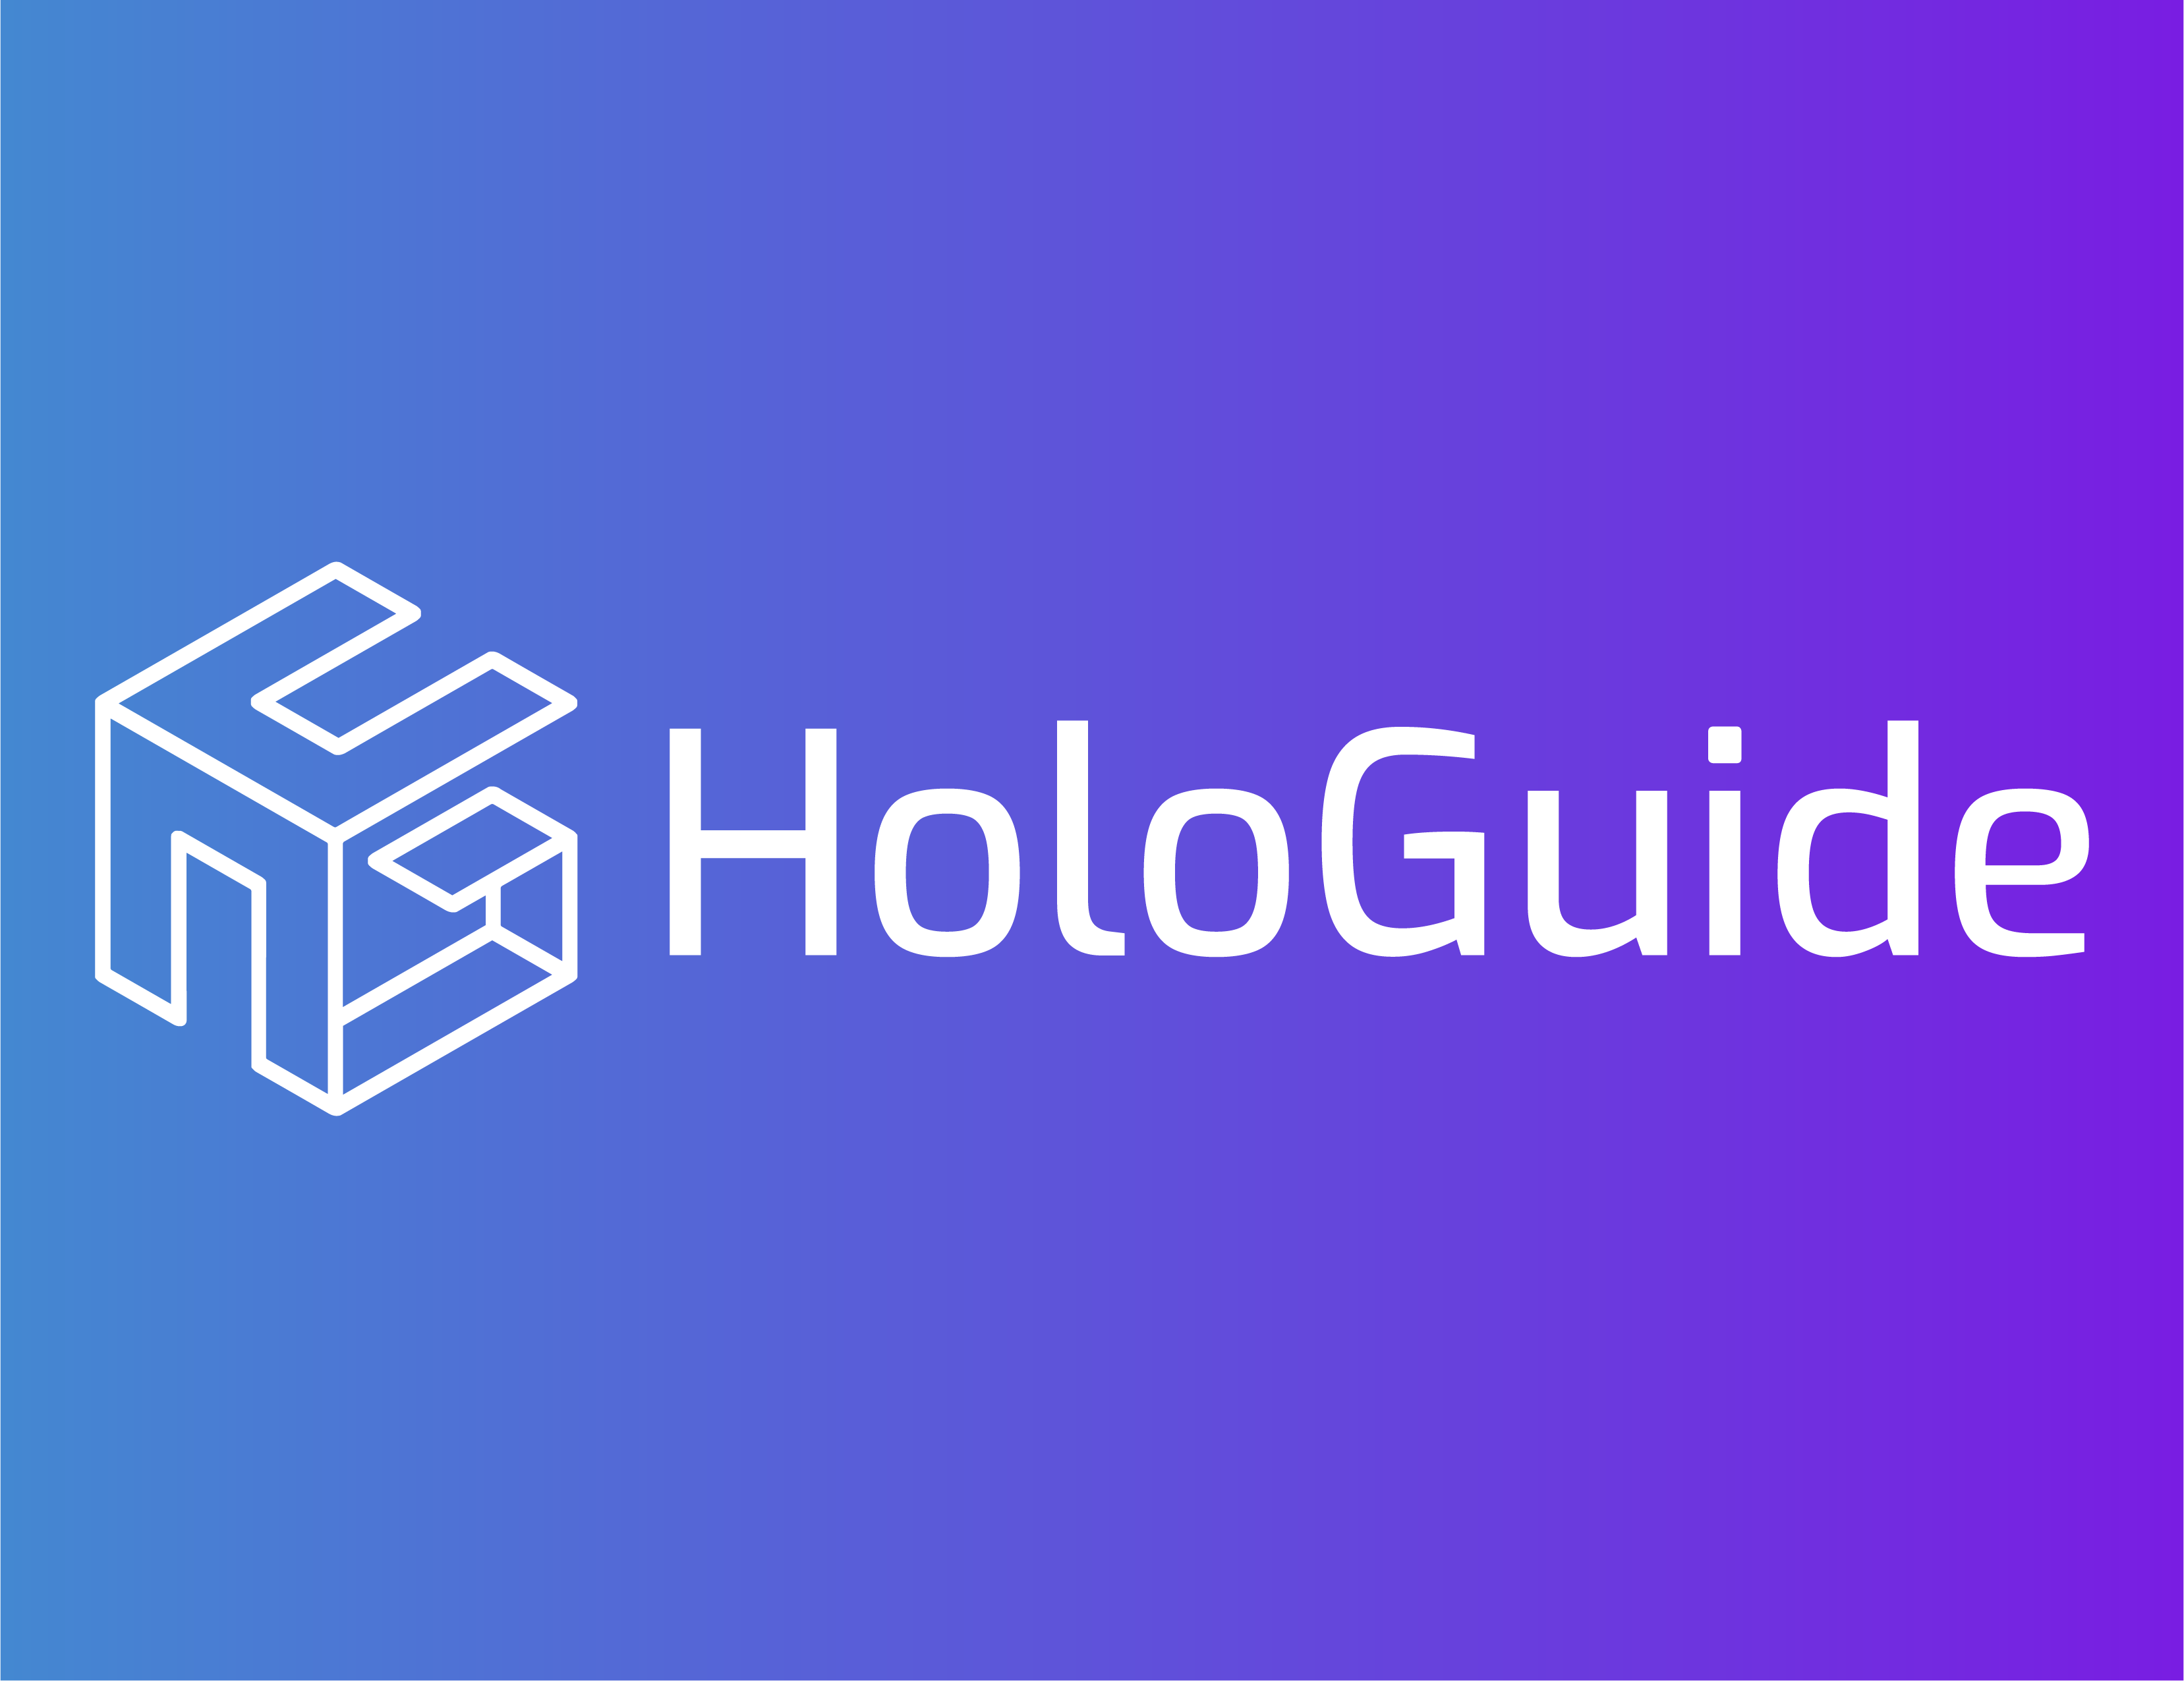 Holo Guide logo